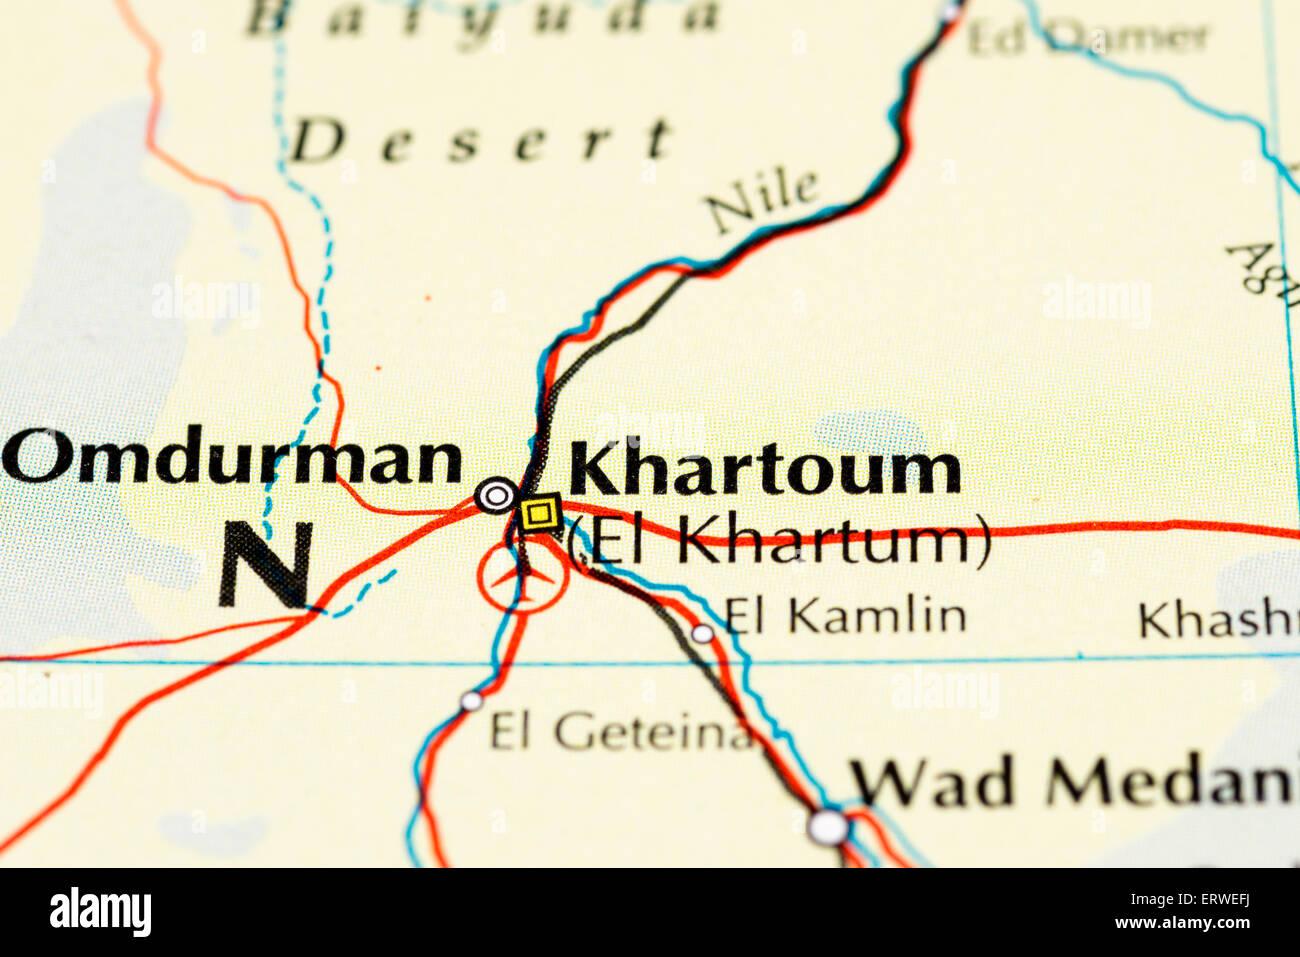 Map Of Sudan Stock Photos & Map Of Sudan Stock Images - Alamy Khartoum Sudan Road Map on atlas mountains map, egypt and sudan map, nile sudan map, damascus syria map, casablanca morocco map, accra ghana map, zambezi river africa map, south sudan region map, south sudan natural resources map, tehran map, istanbul turkey map, tripoli libya map, tel aviv map, dongola sudan map, nairobi map, riyadh map, nile river map, s. sudan map, mogadishu somalia map,